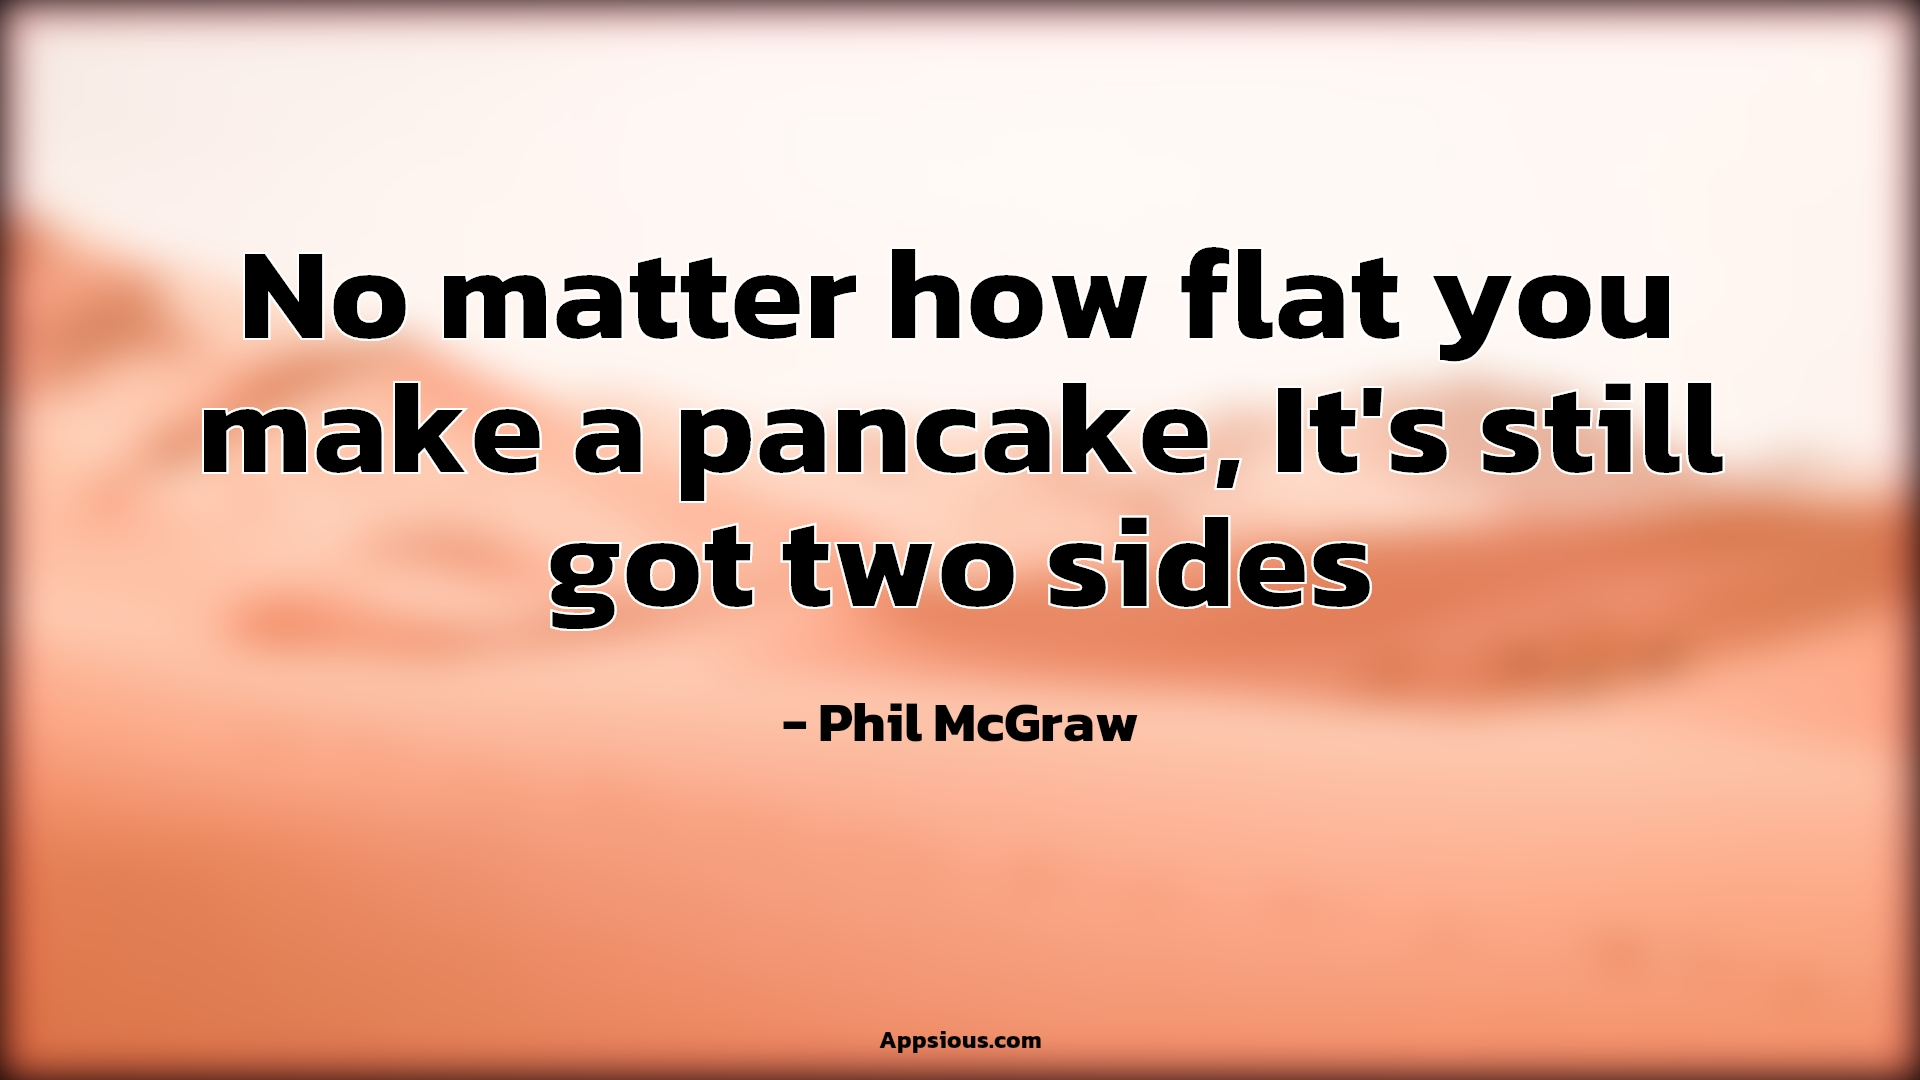 No matter how flat you make a pancake, It's still got two sides